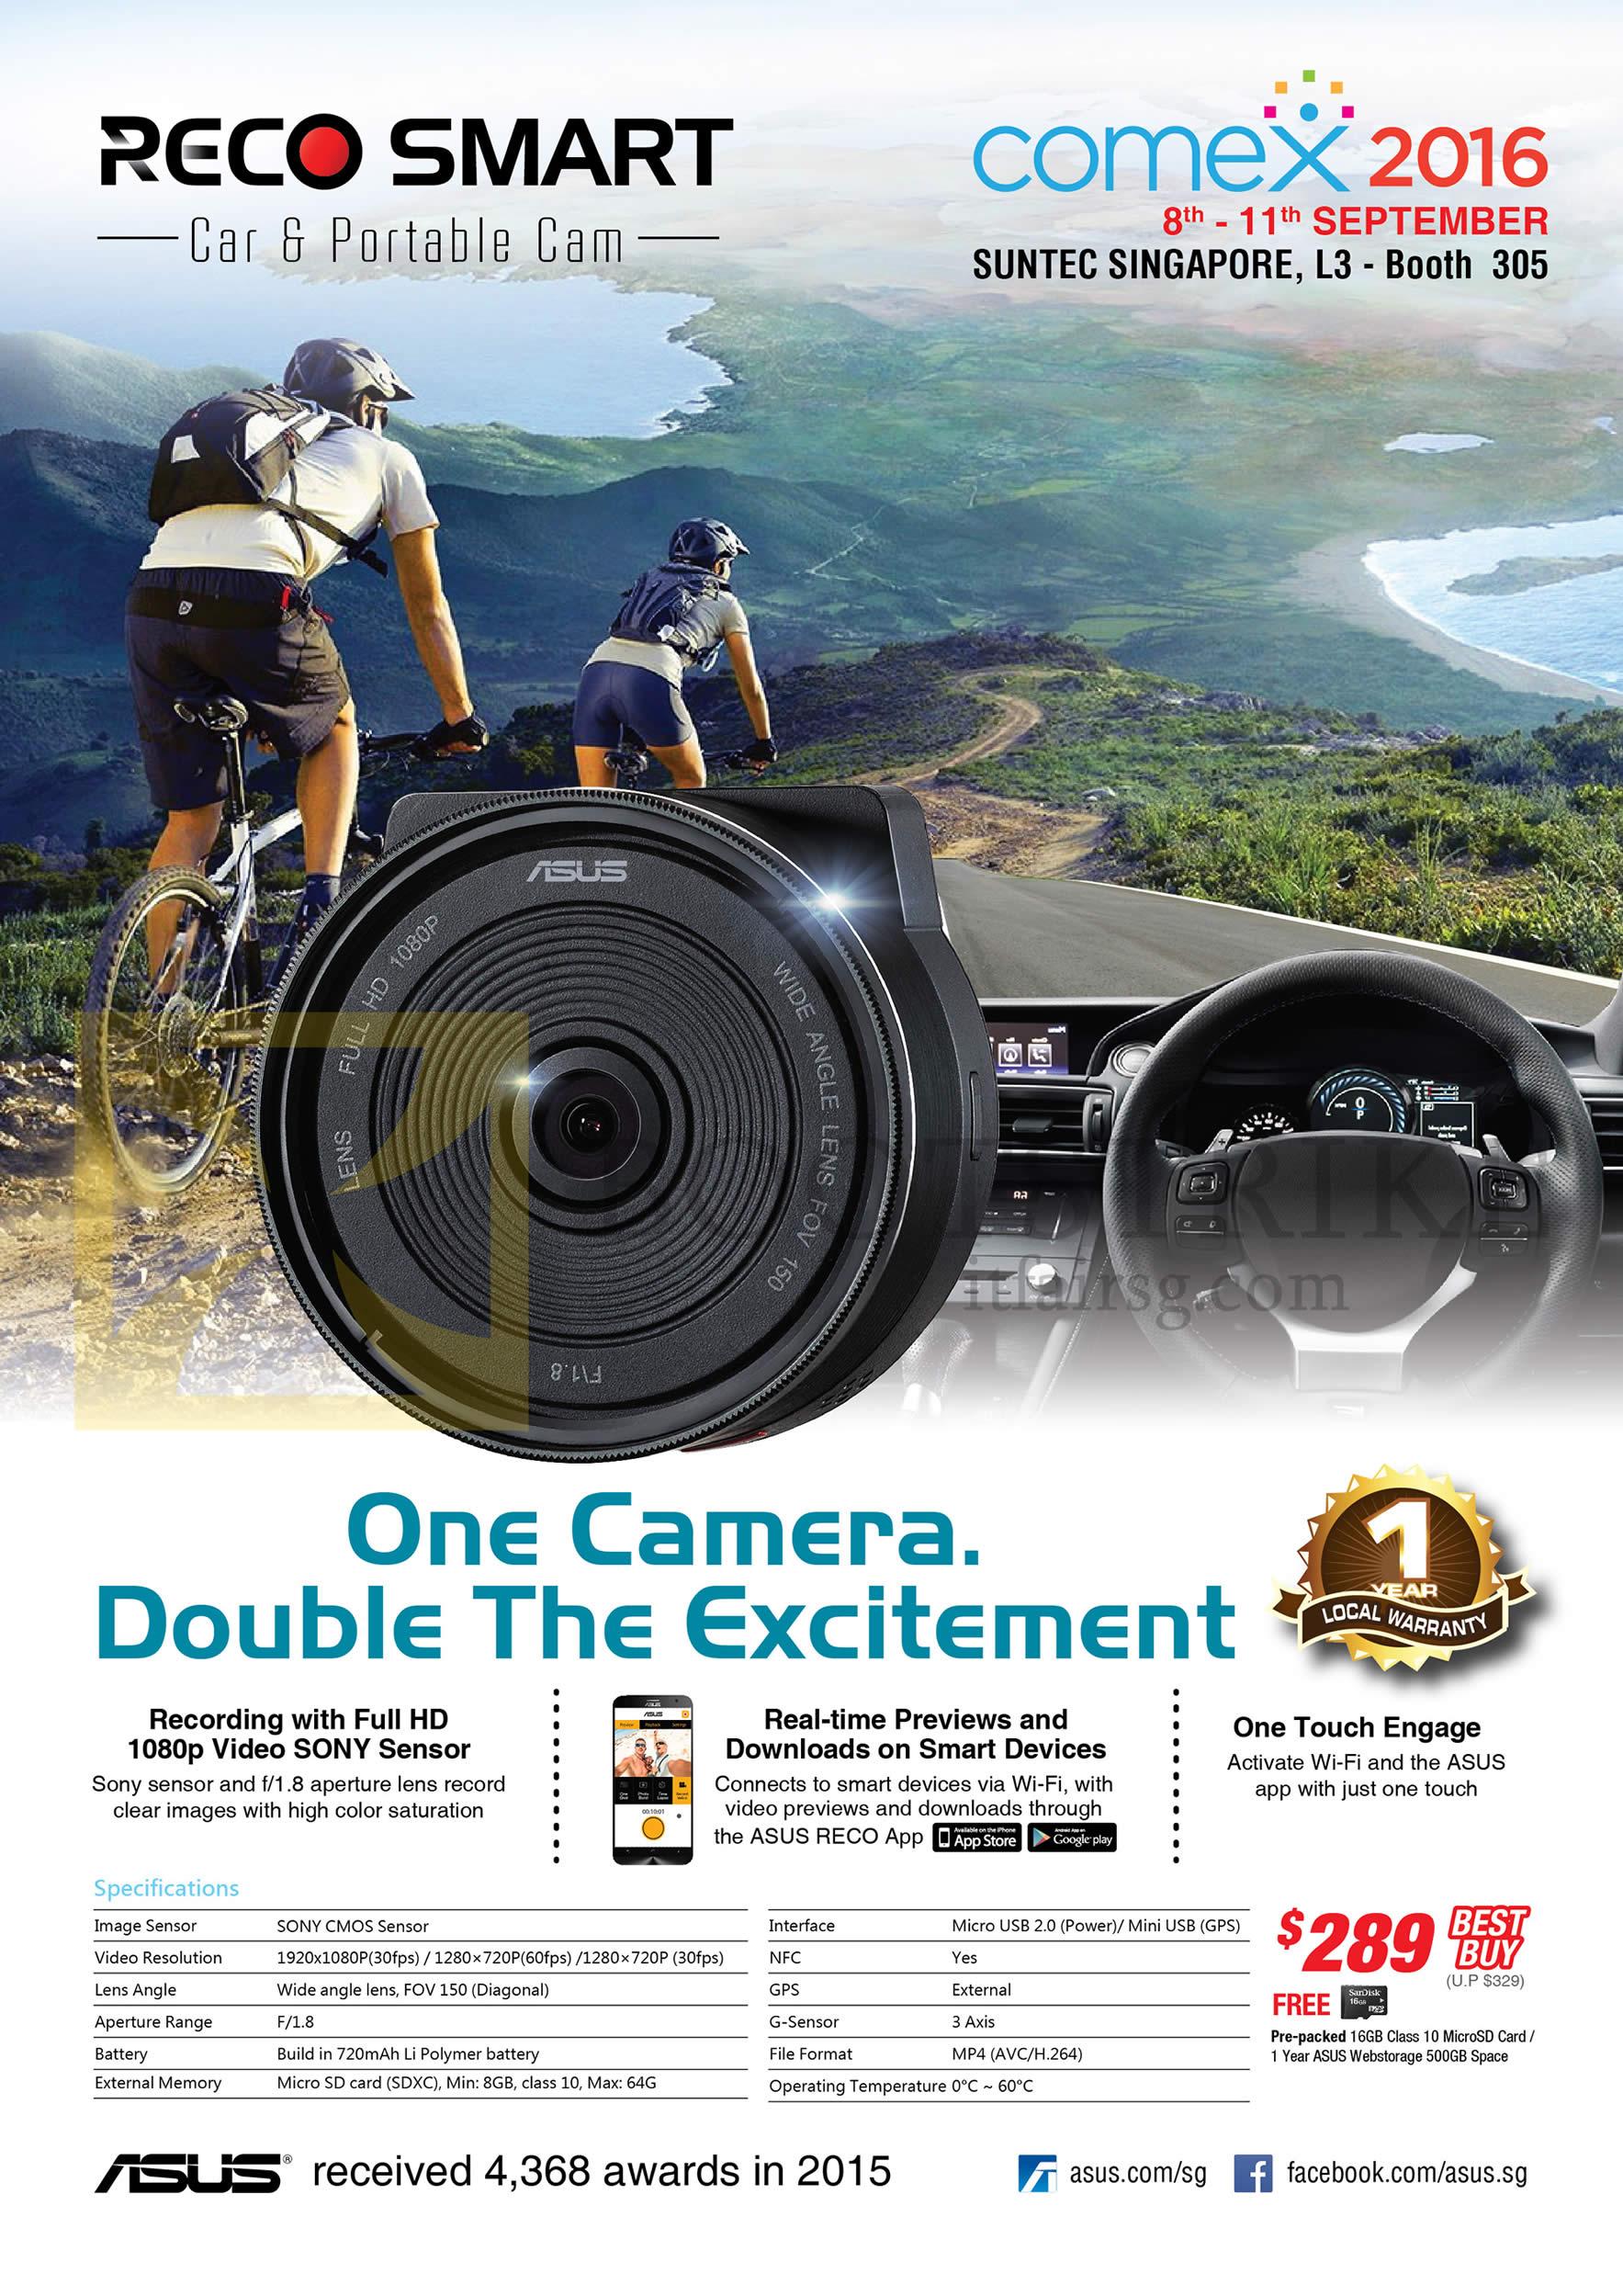 COMEX 2016 price list image brochure of ASUS Reco Smart Car Portable Camera